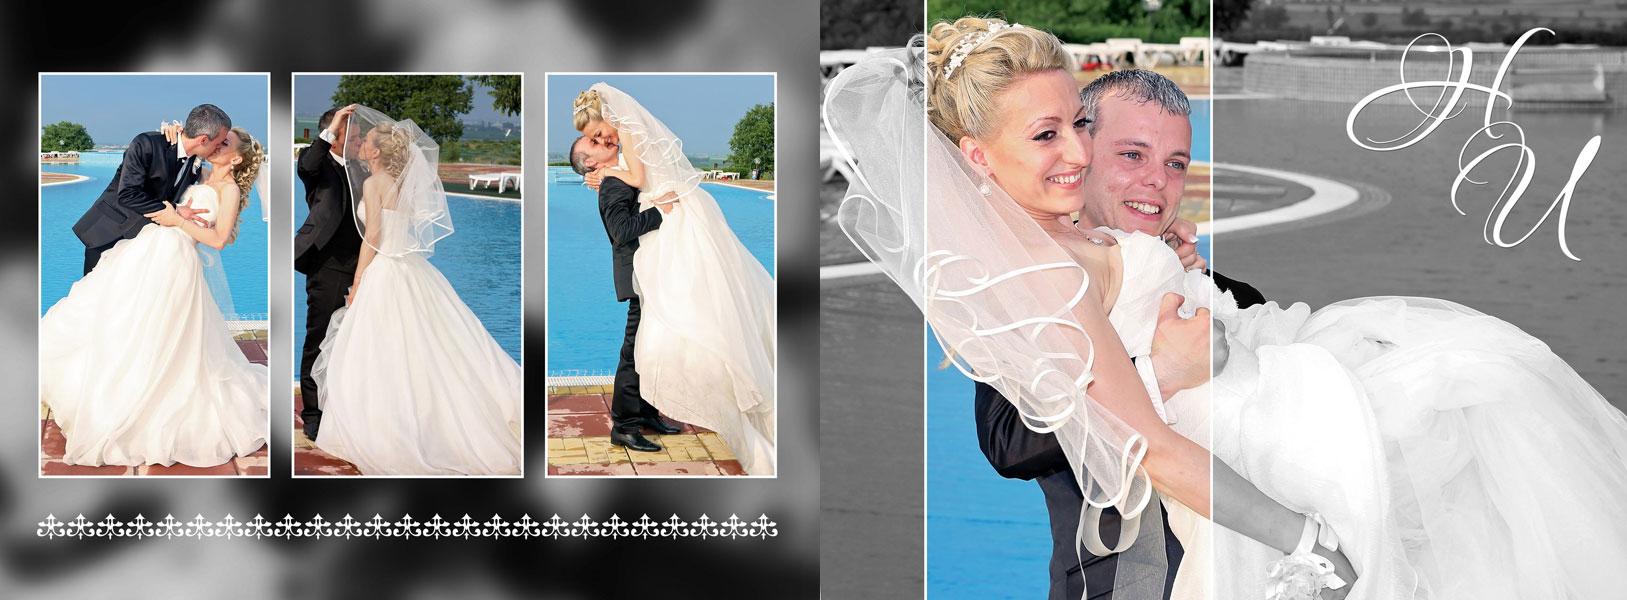 Drag Studio | Детска и сватбена фотография. | 20-21.jpg